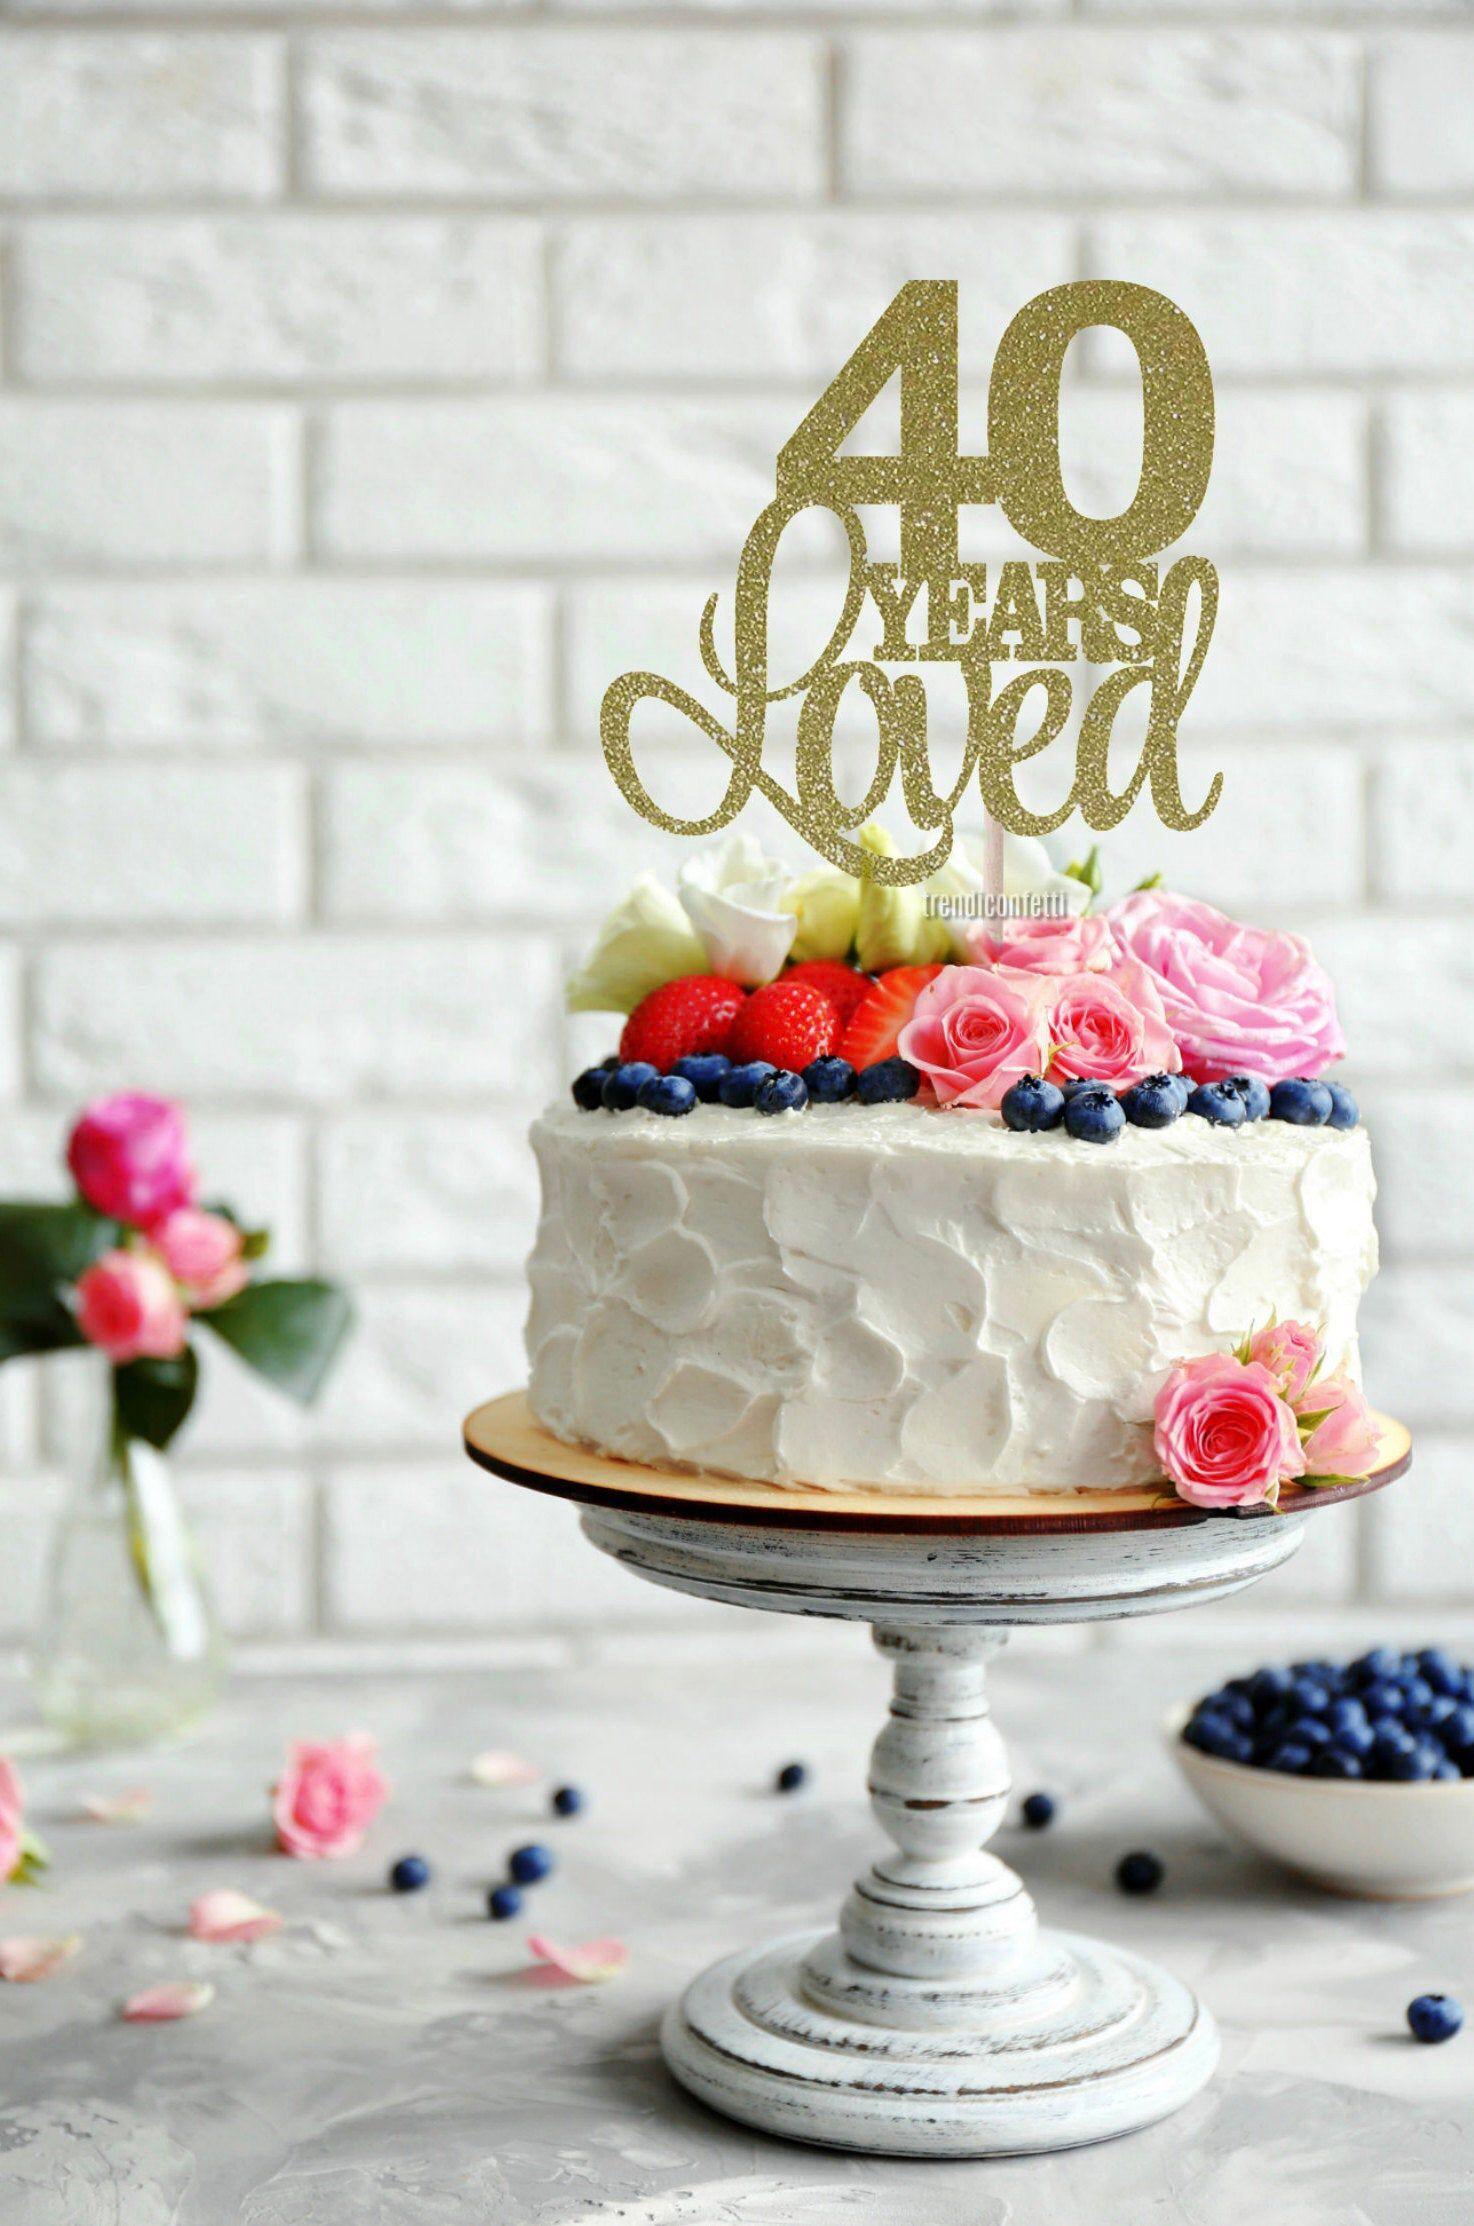 Surprising 40 Years Loved Cake Topper 40Th Birthday Cake Topper Happy 40Th Funny Birthday Cards Online Kookostrdamsfinfo